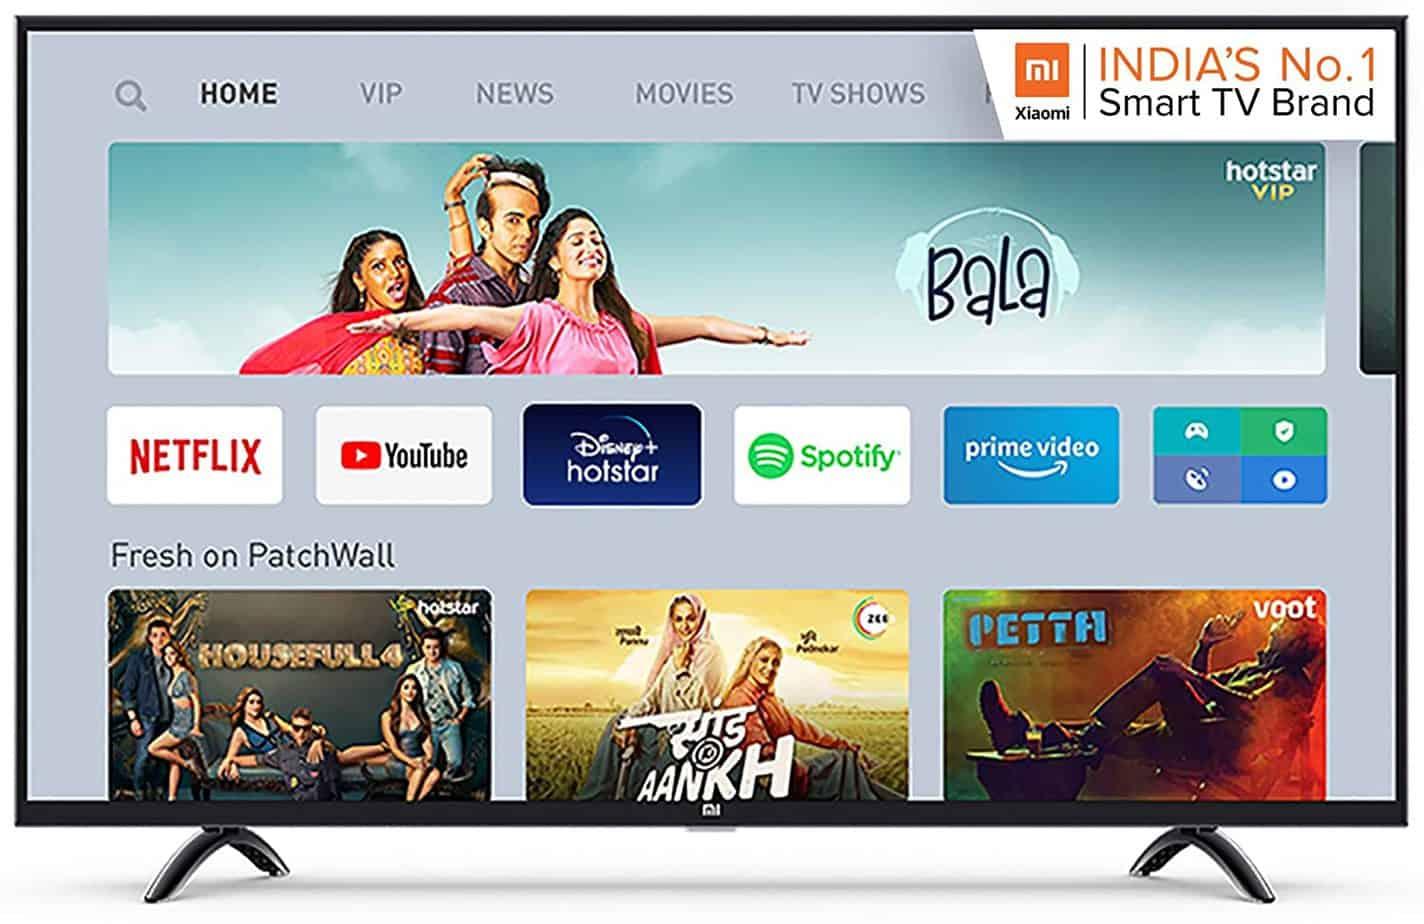 Mi 80 cm HD Ready Android LED TV